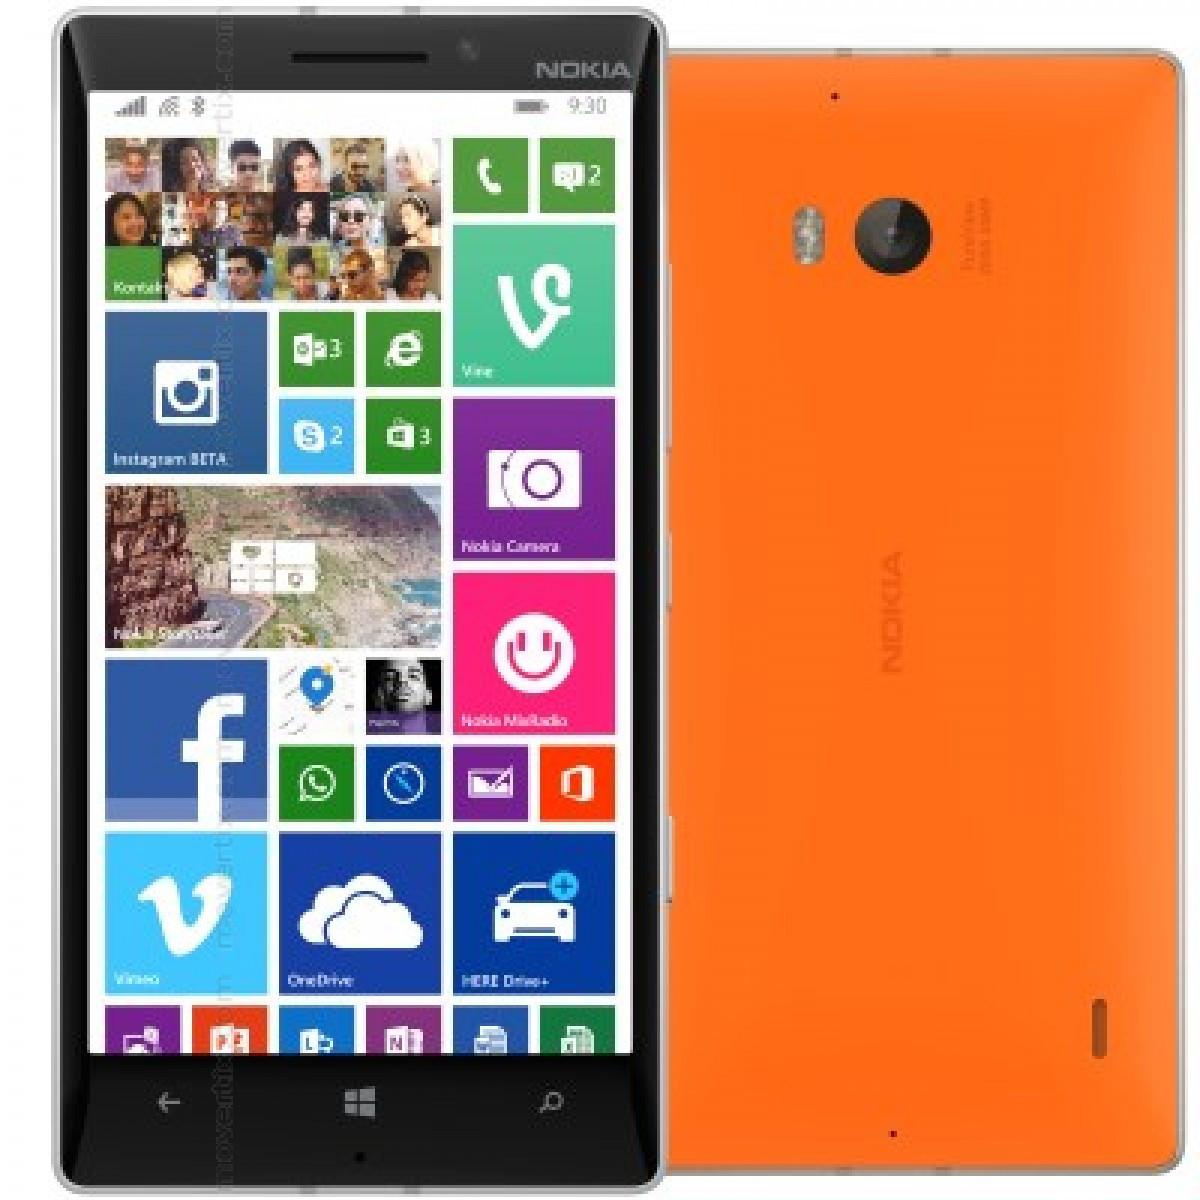 Cмартфон Nokia Lumia 930 Orange Win10, FHD, 20MP 2\32gb Quad core 2.2 GHz2420 mAh  + подарки